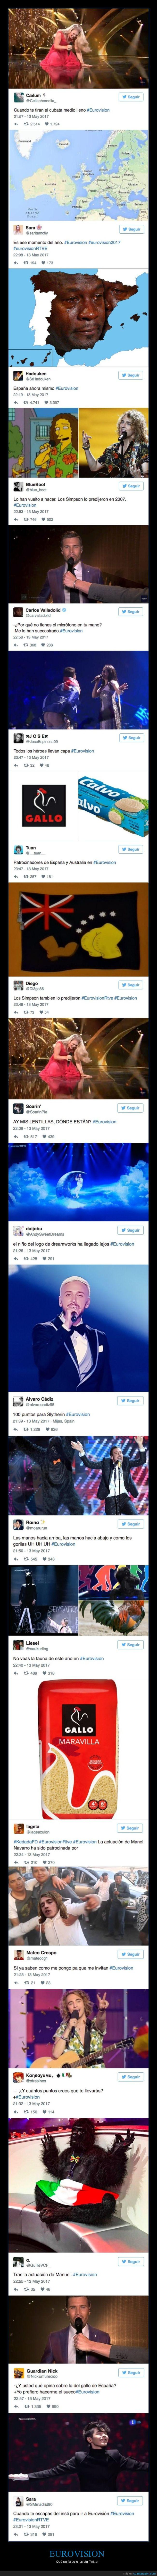 certamen,concurso,eurovision,memes